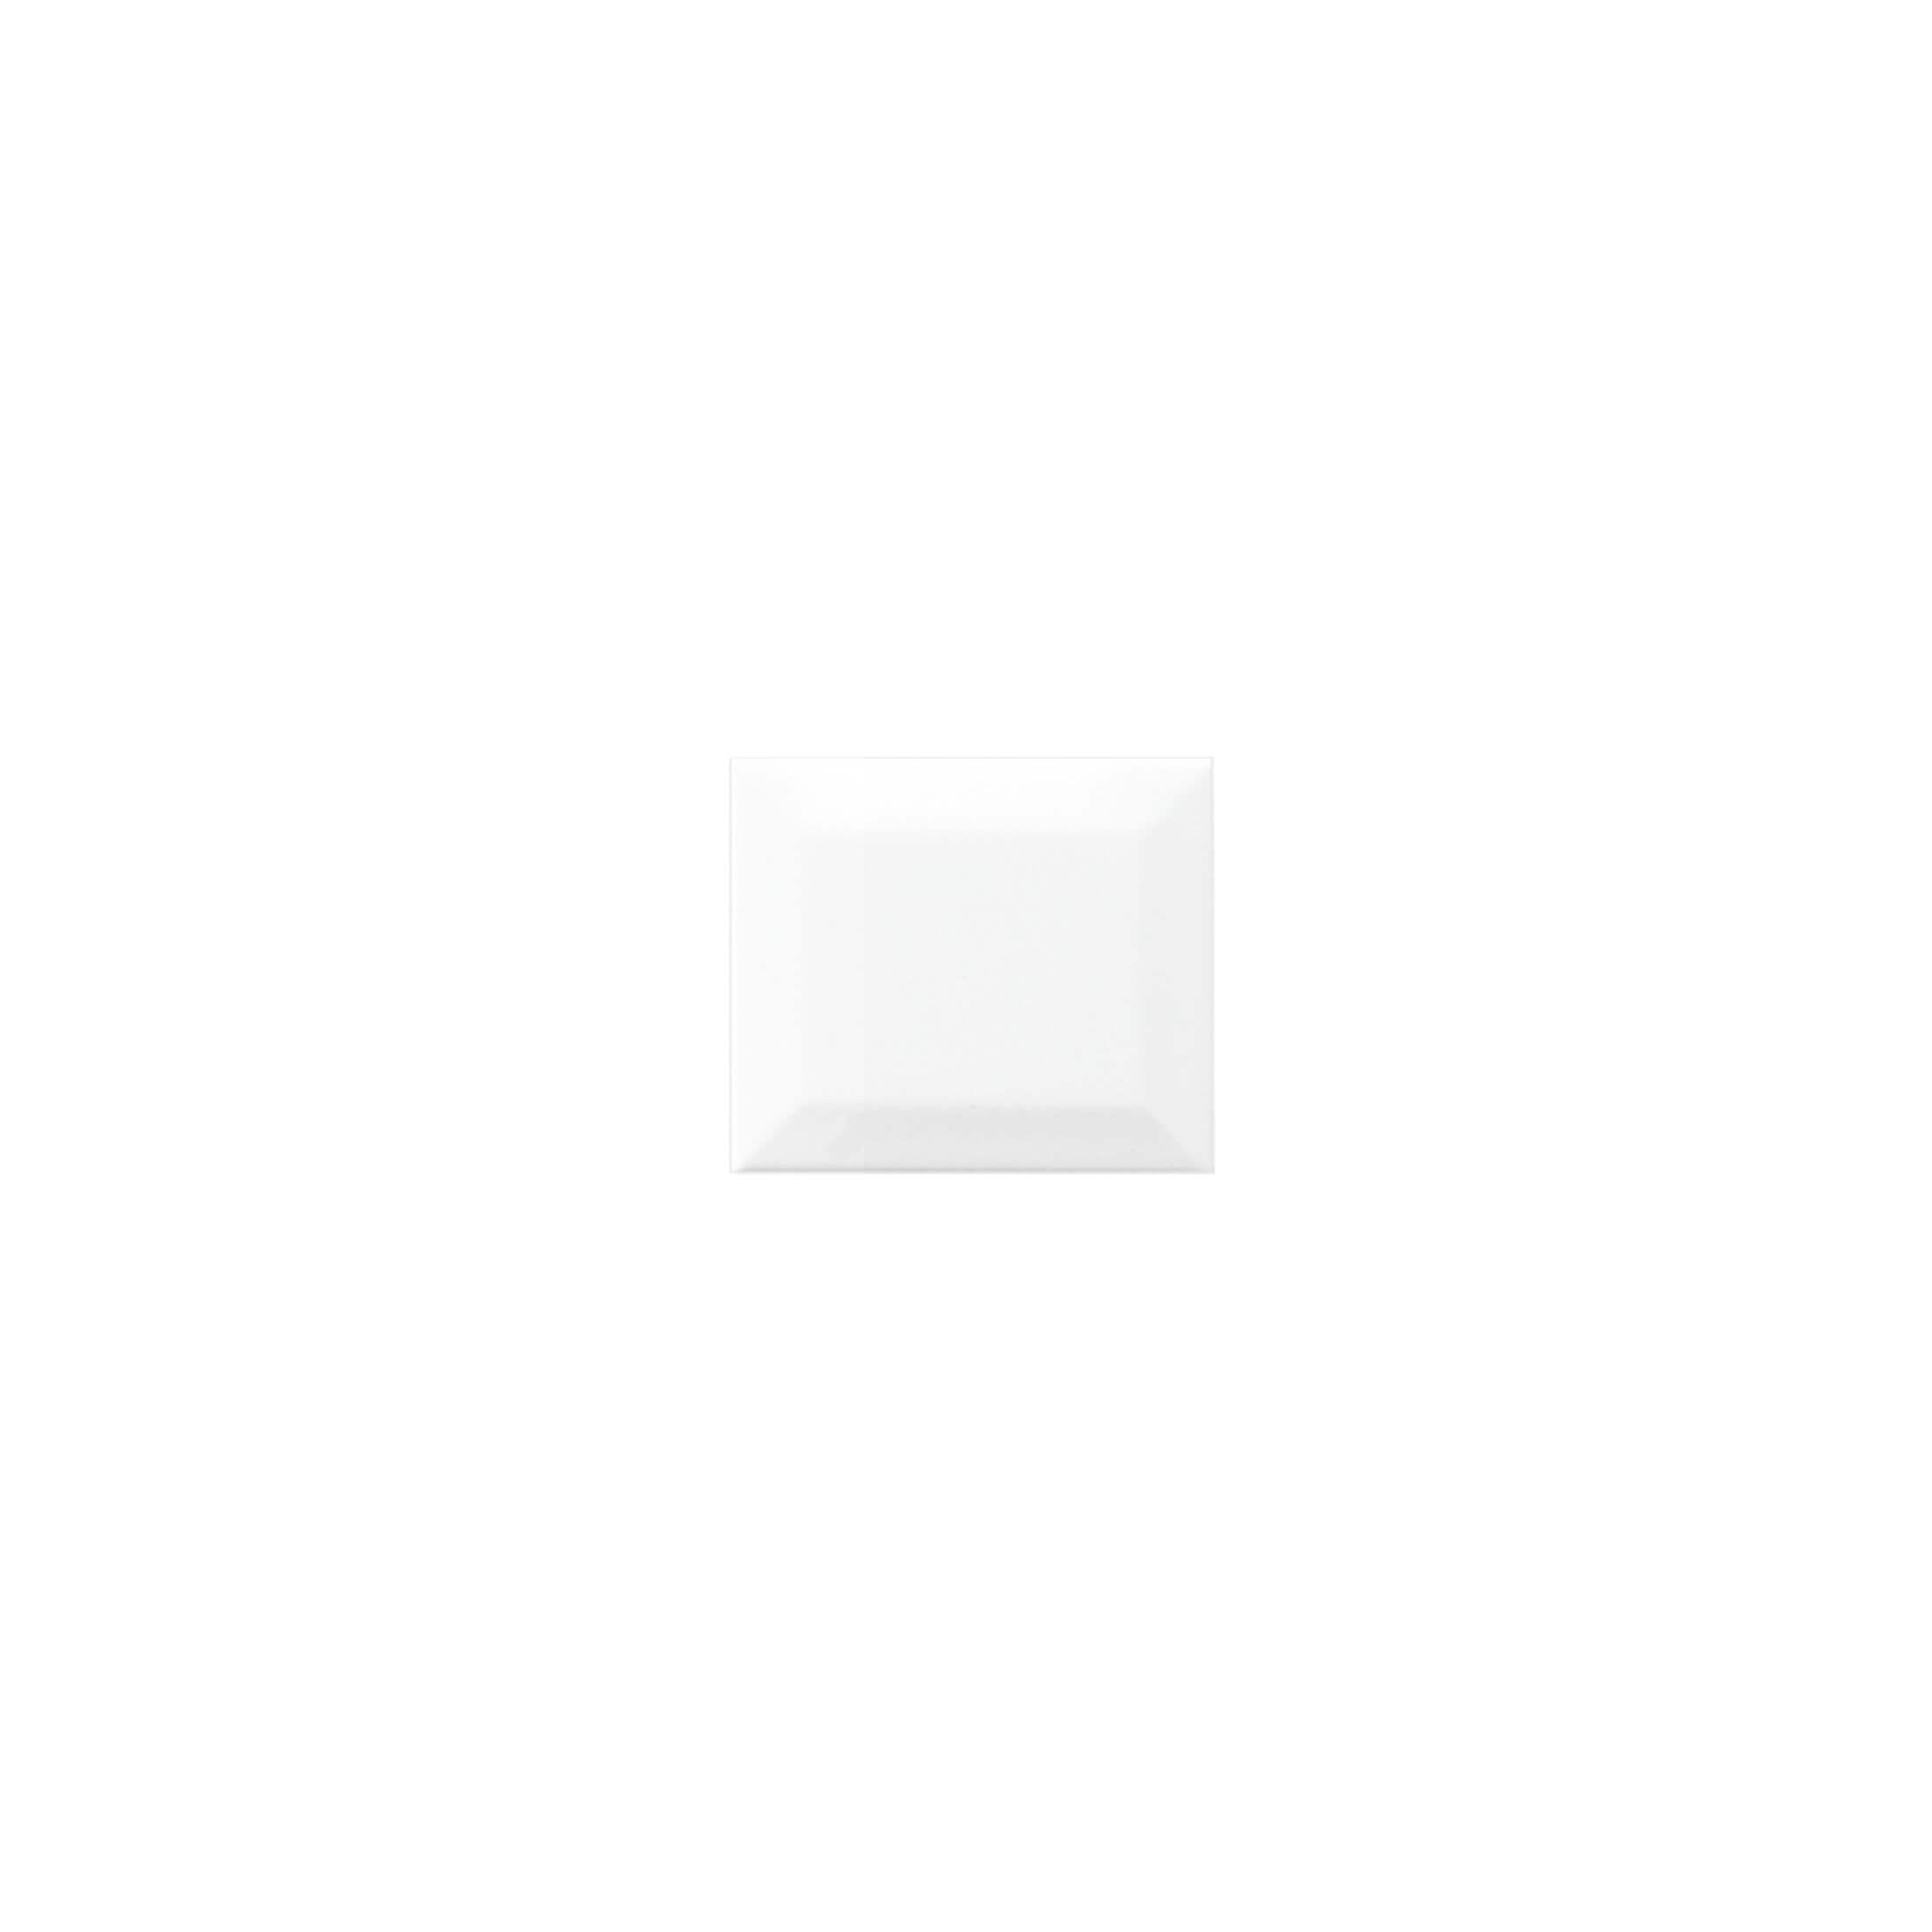 ADNE2034 - BISELADO PB - 7.5 cm X 7.5 cm